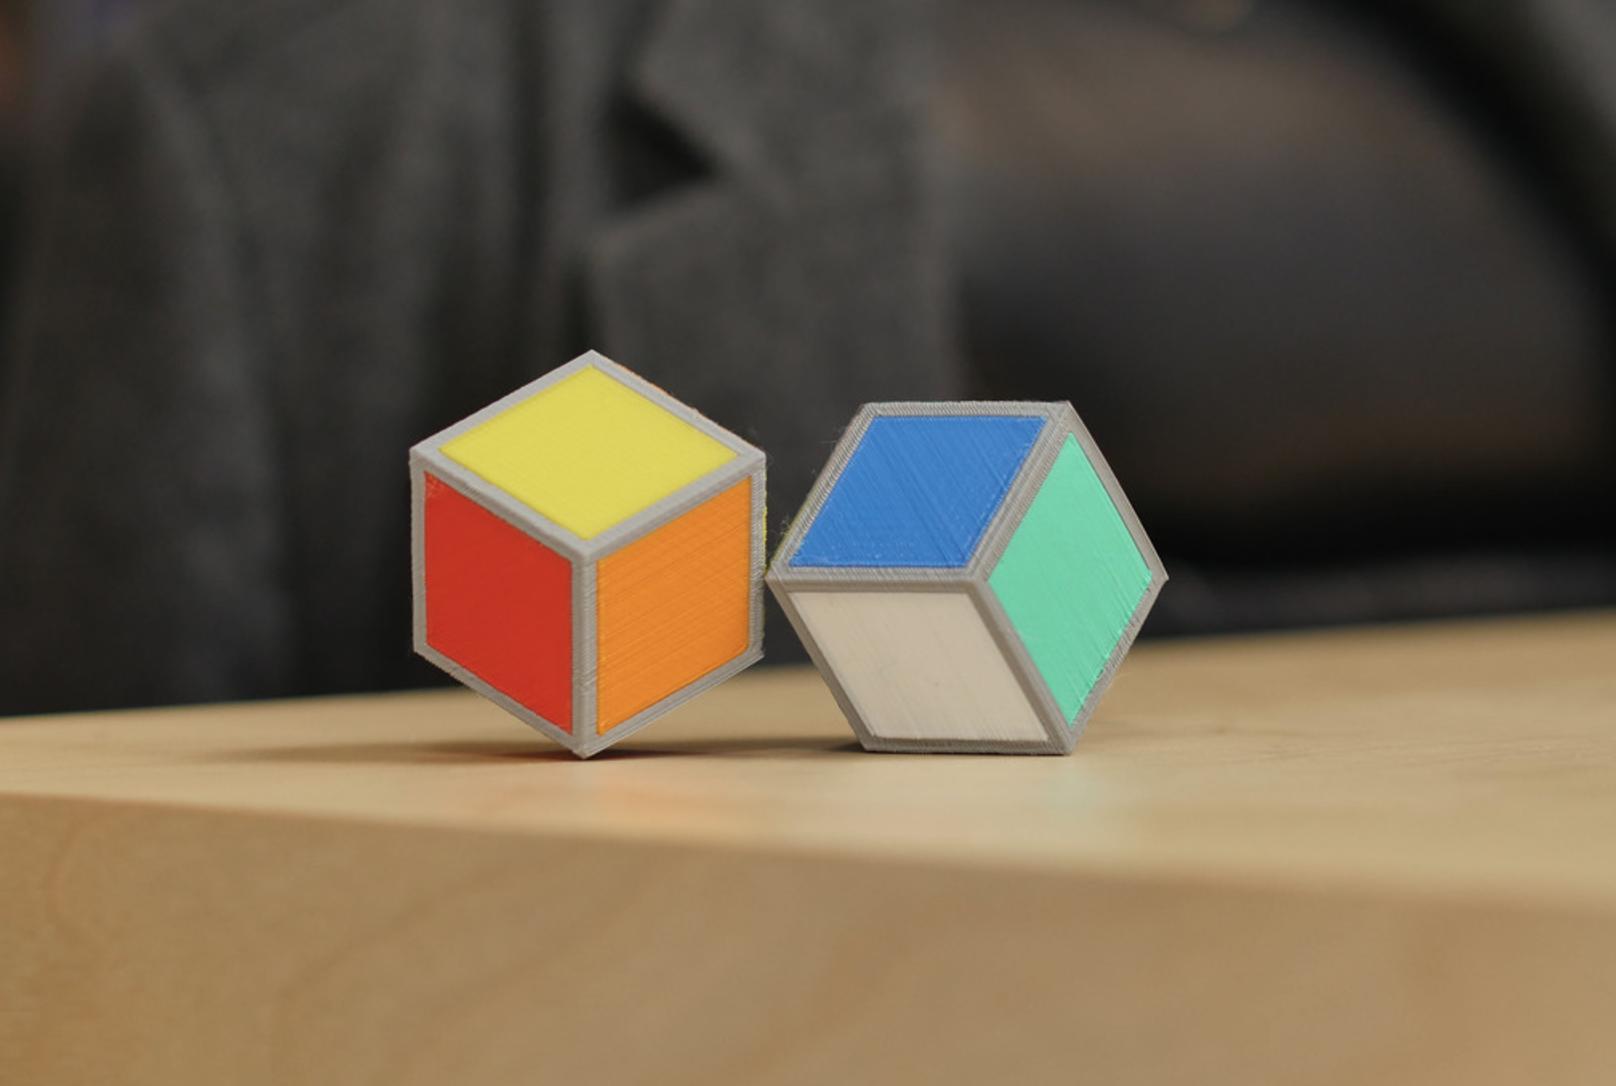 Capture d'écran 2016-12-01 à 10.48.25.png Download free STL file Cube Illusion (Rhombic Dodecahedron) • 3D printer template, MosaicManufacturing